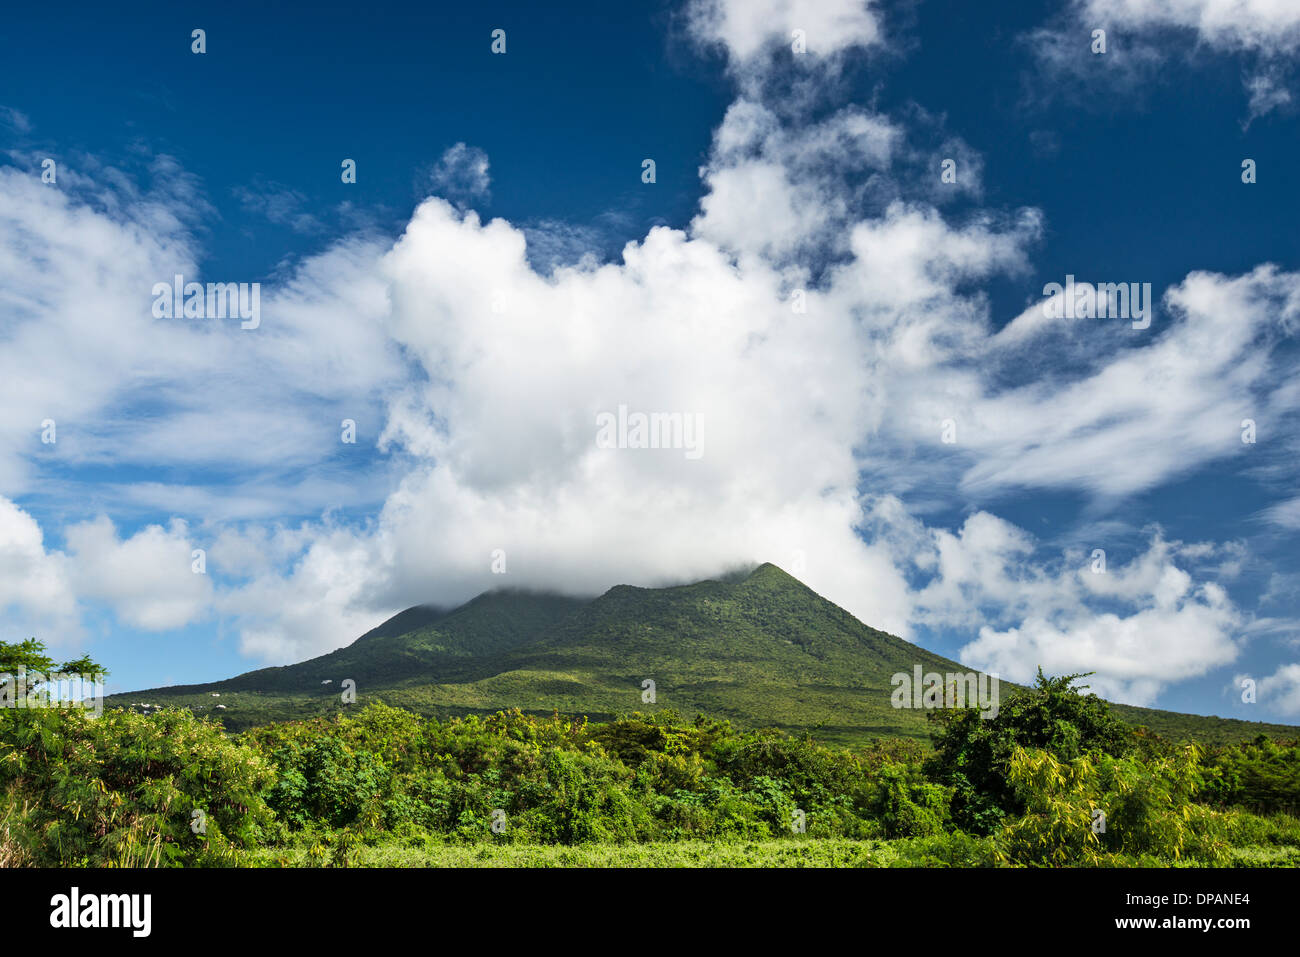 Nevis Peak, ein Vulkan in der Karibik. Stockbild